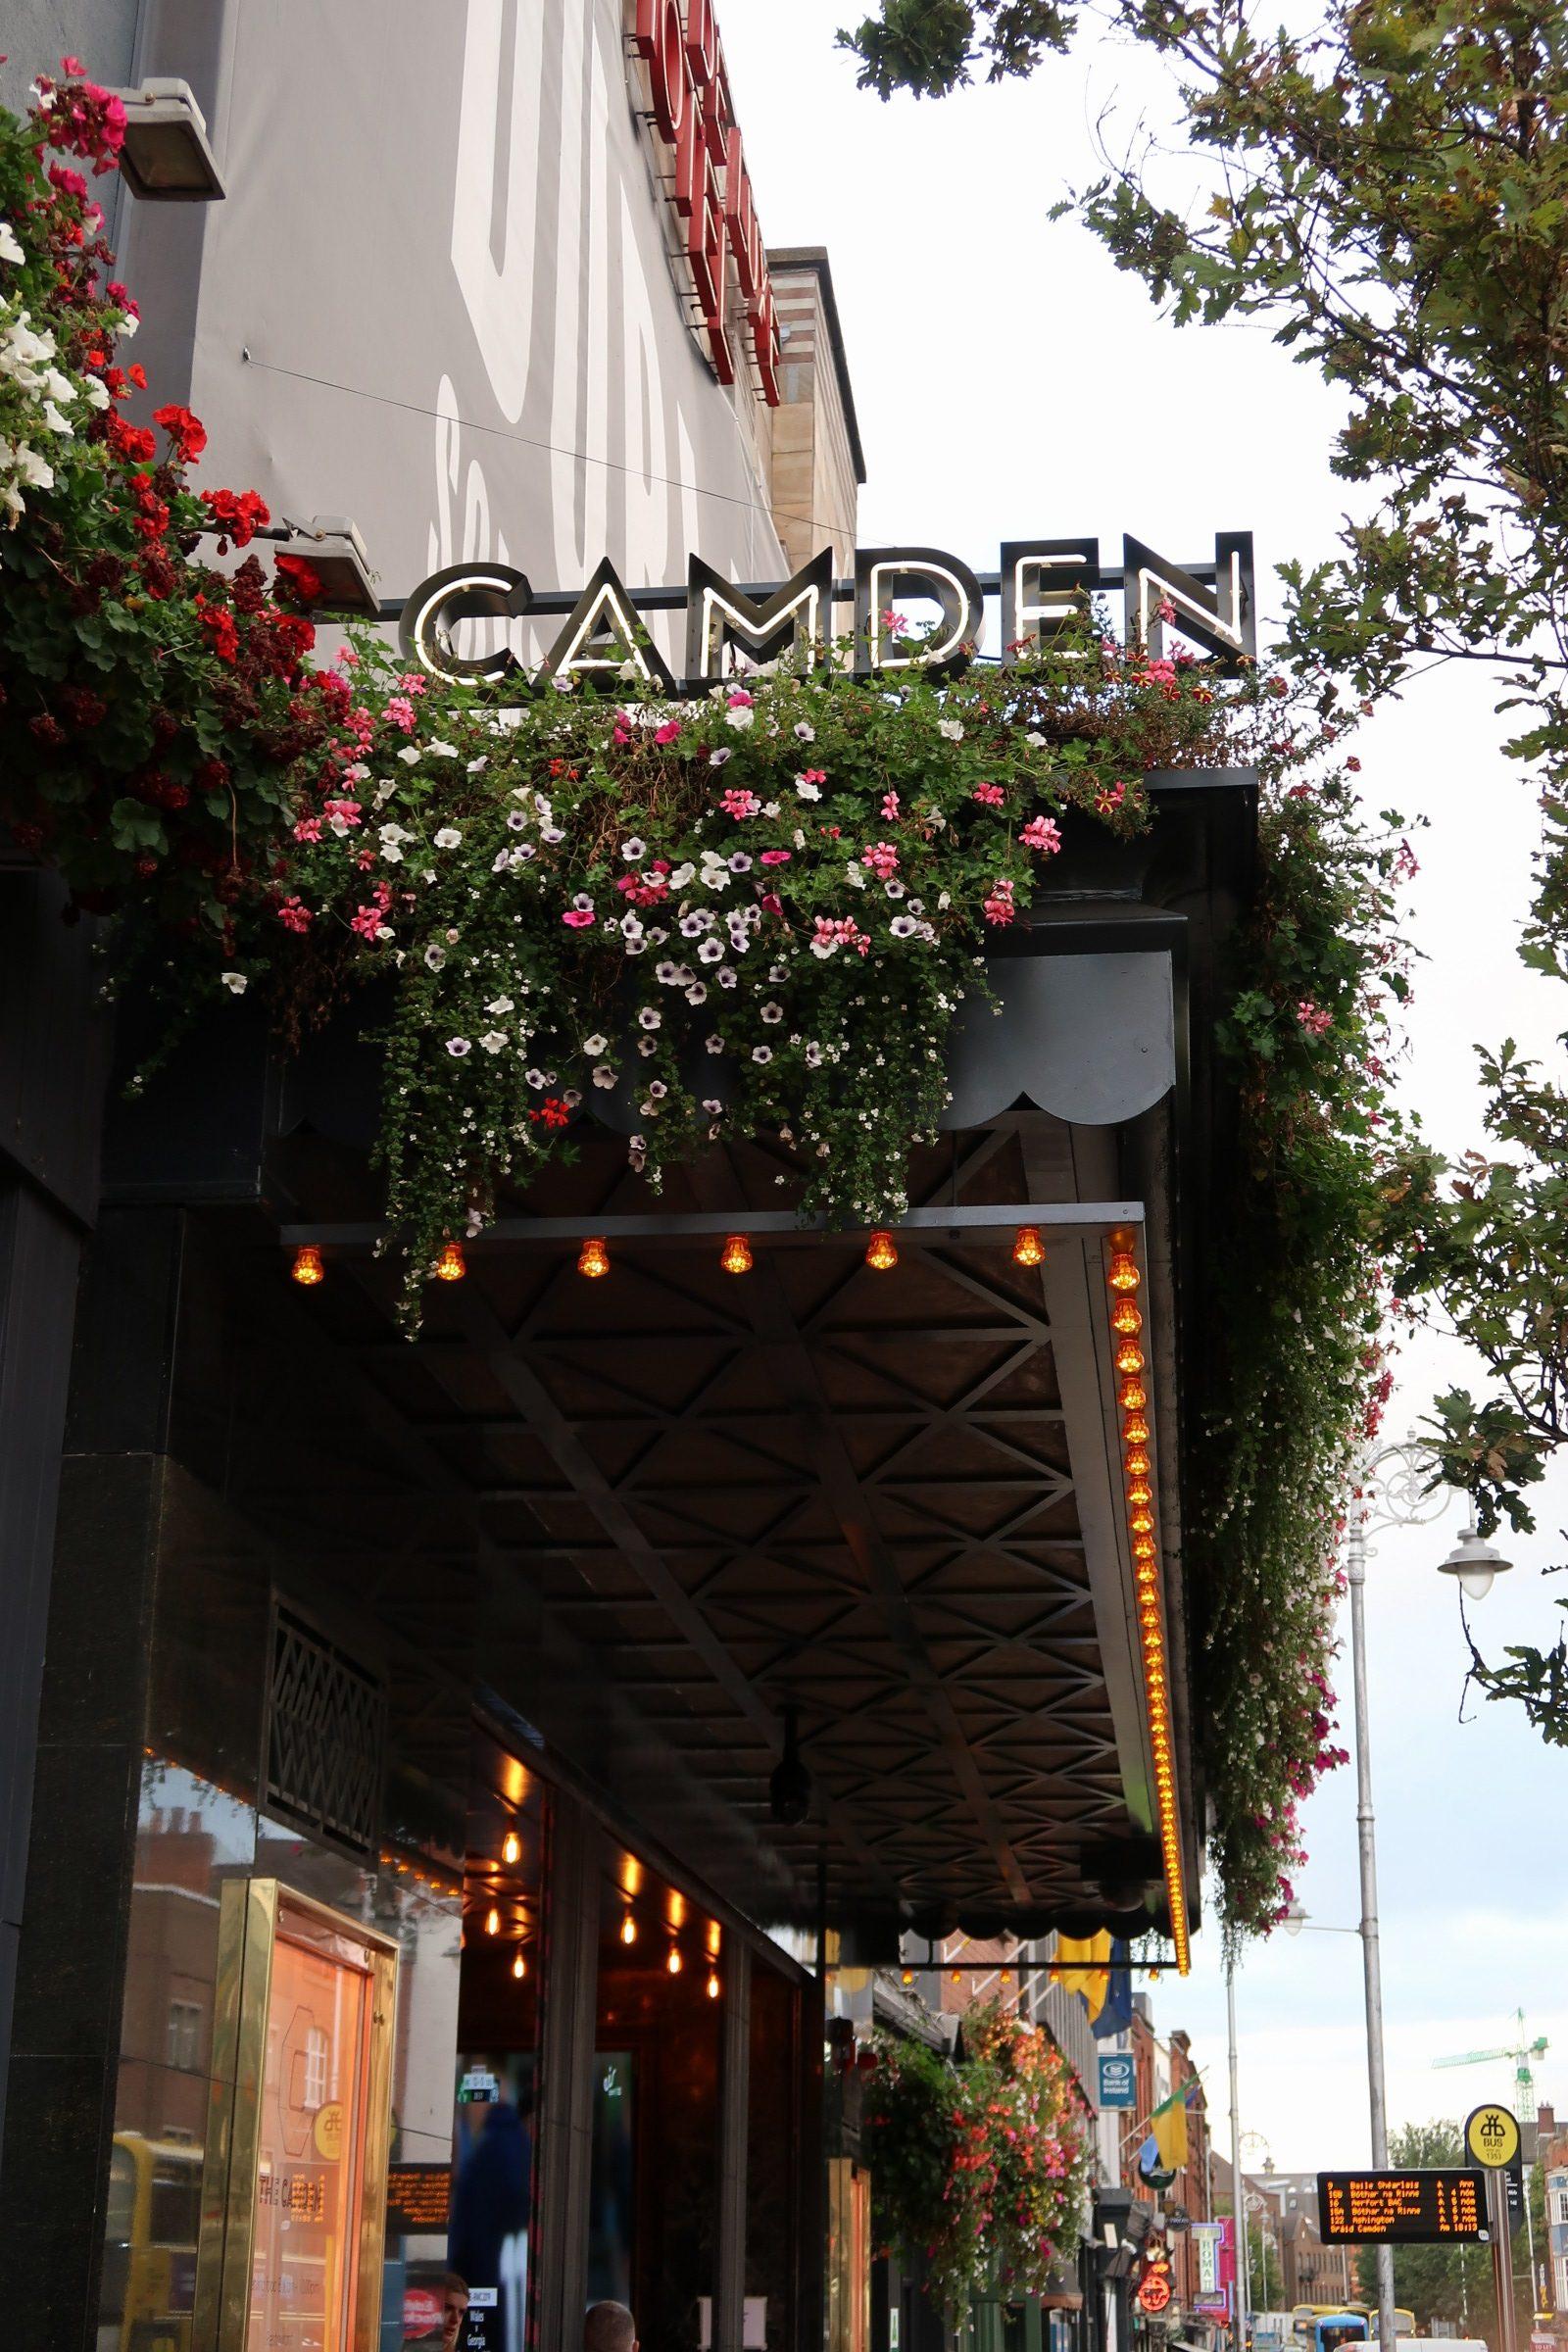 The Camden Bar Review